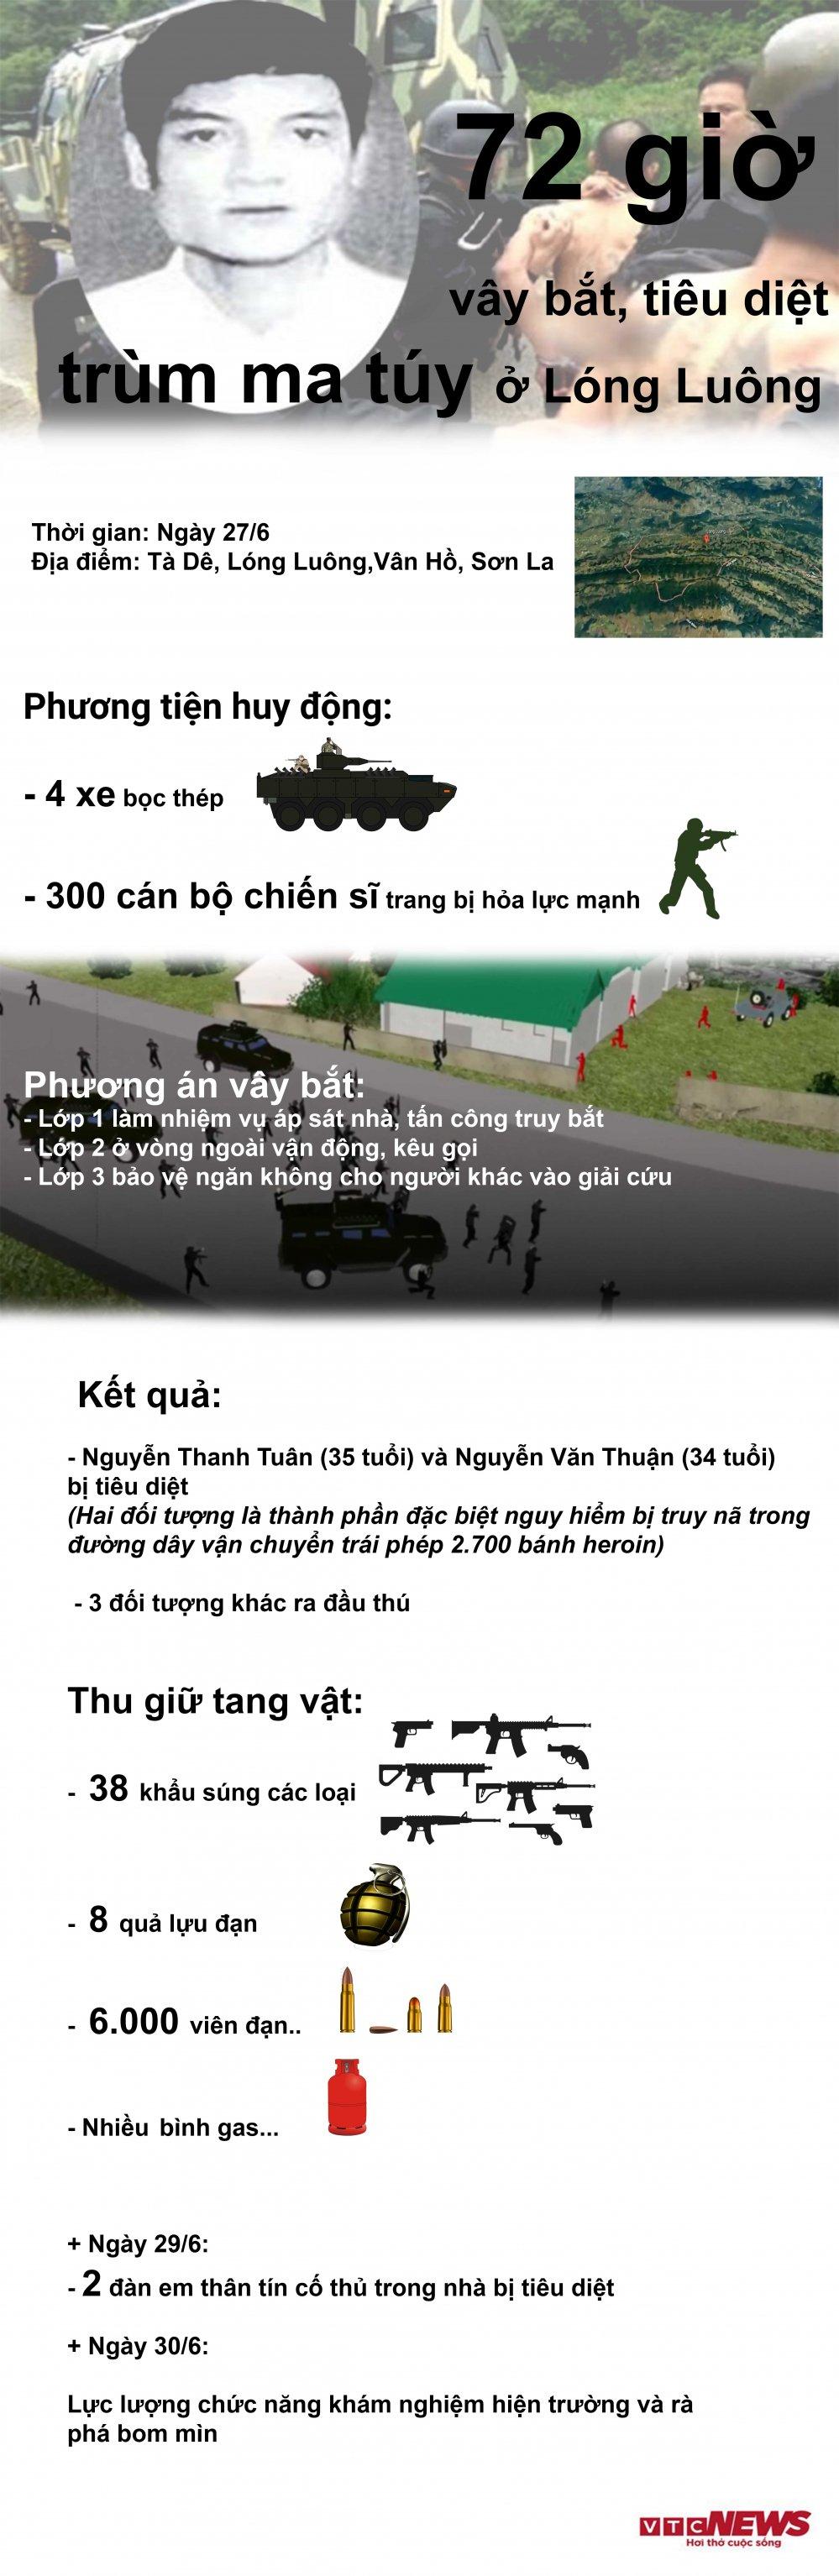 Infographic: 72 gio vay bat nghet tho, tieu diet trum ma tuy tai sao huyet Long Luong hinh anh 1